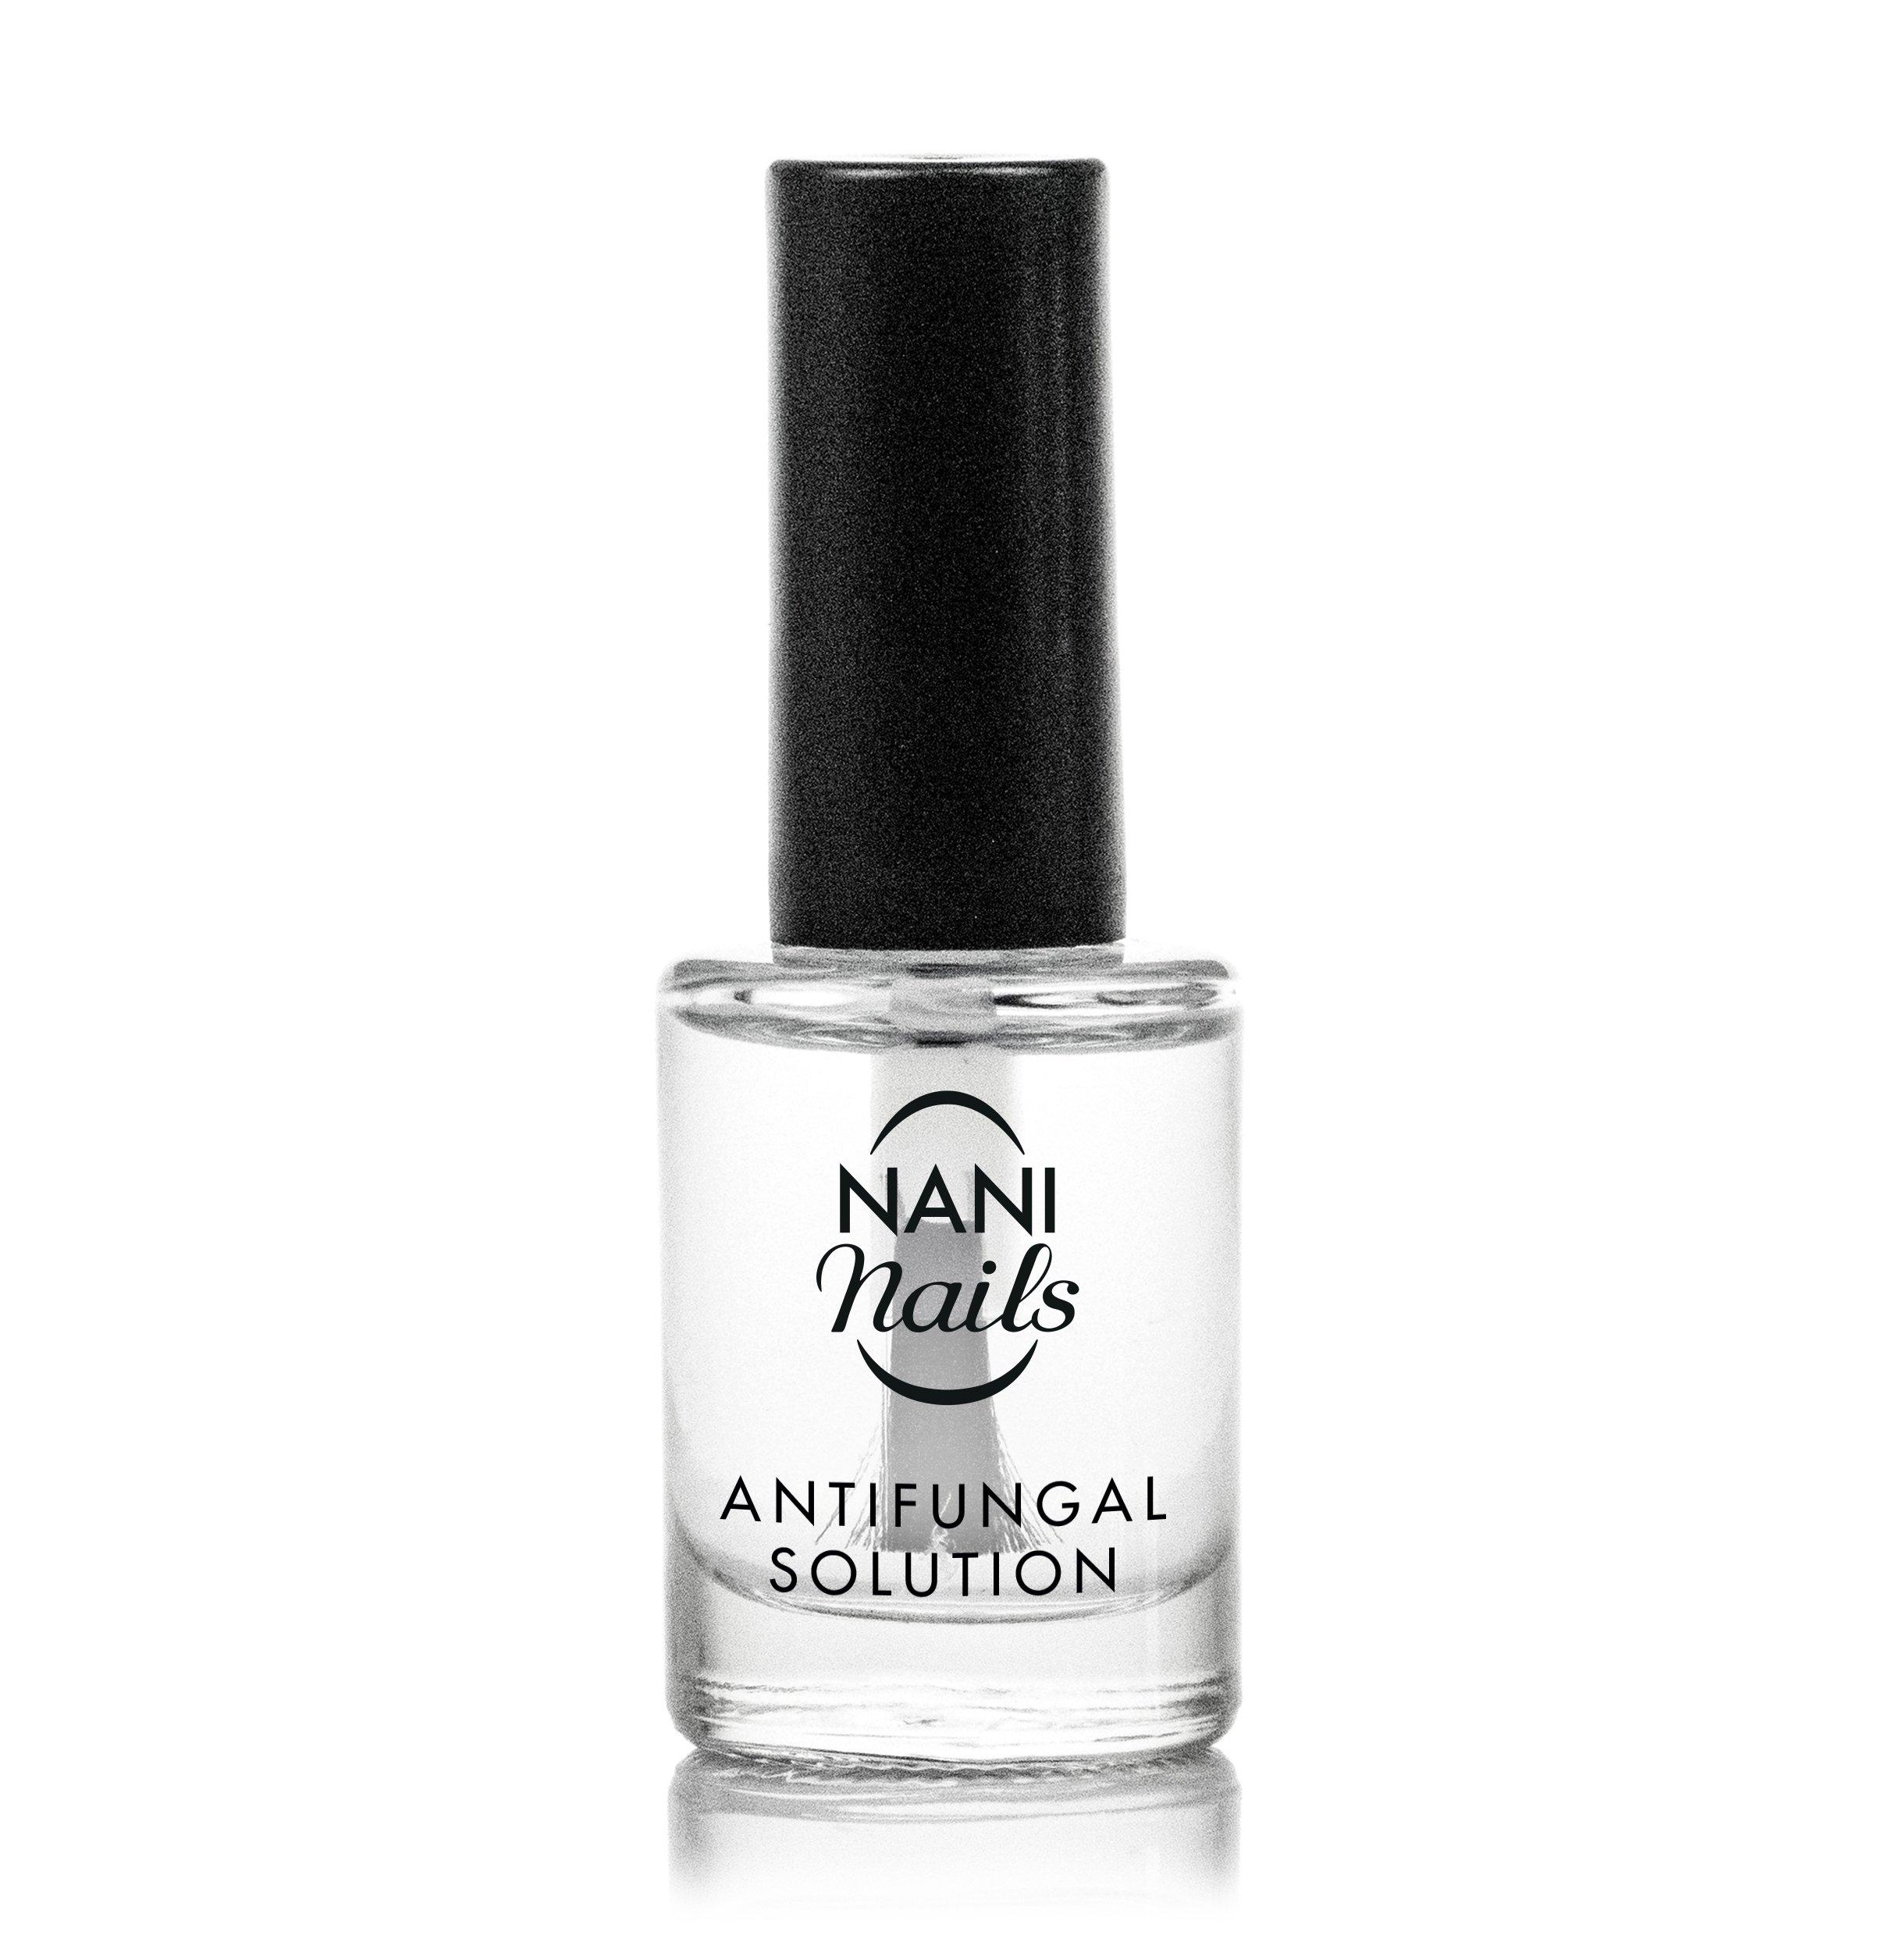 Nani Antifungal Solution Protiplisnovy Roztok 11 Ml Naninails Cz